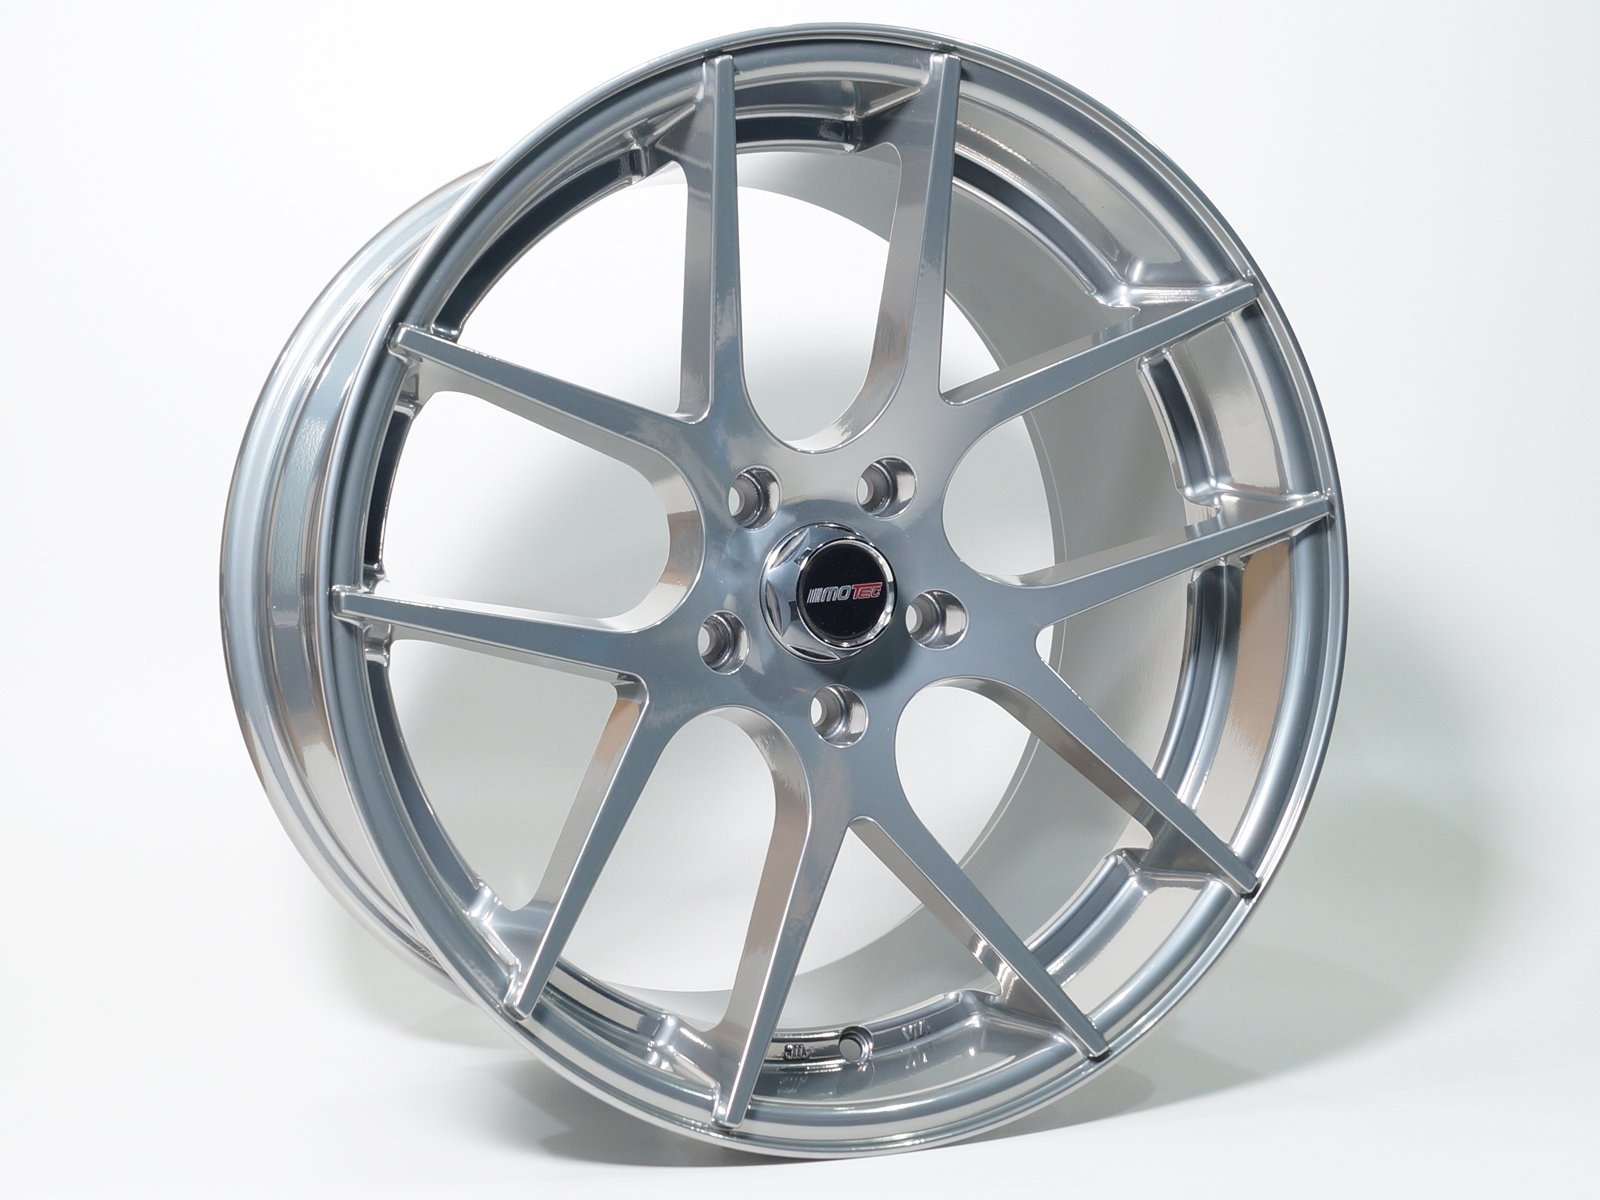 pulverlack farbtrend chromsilber mainhattan wheels. Black Bedroom Furniture Sets. Home Design Ideas